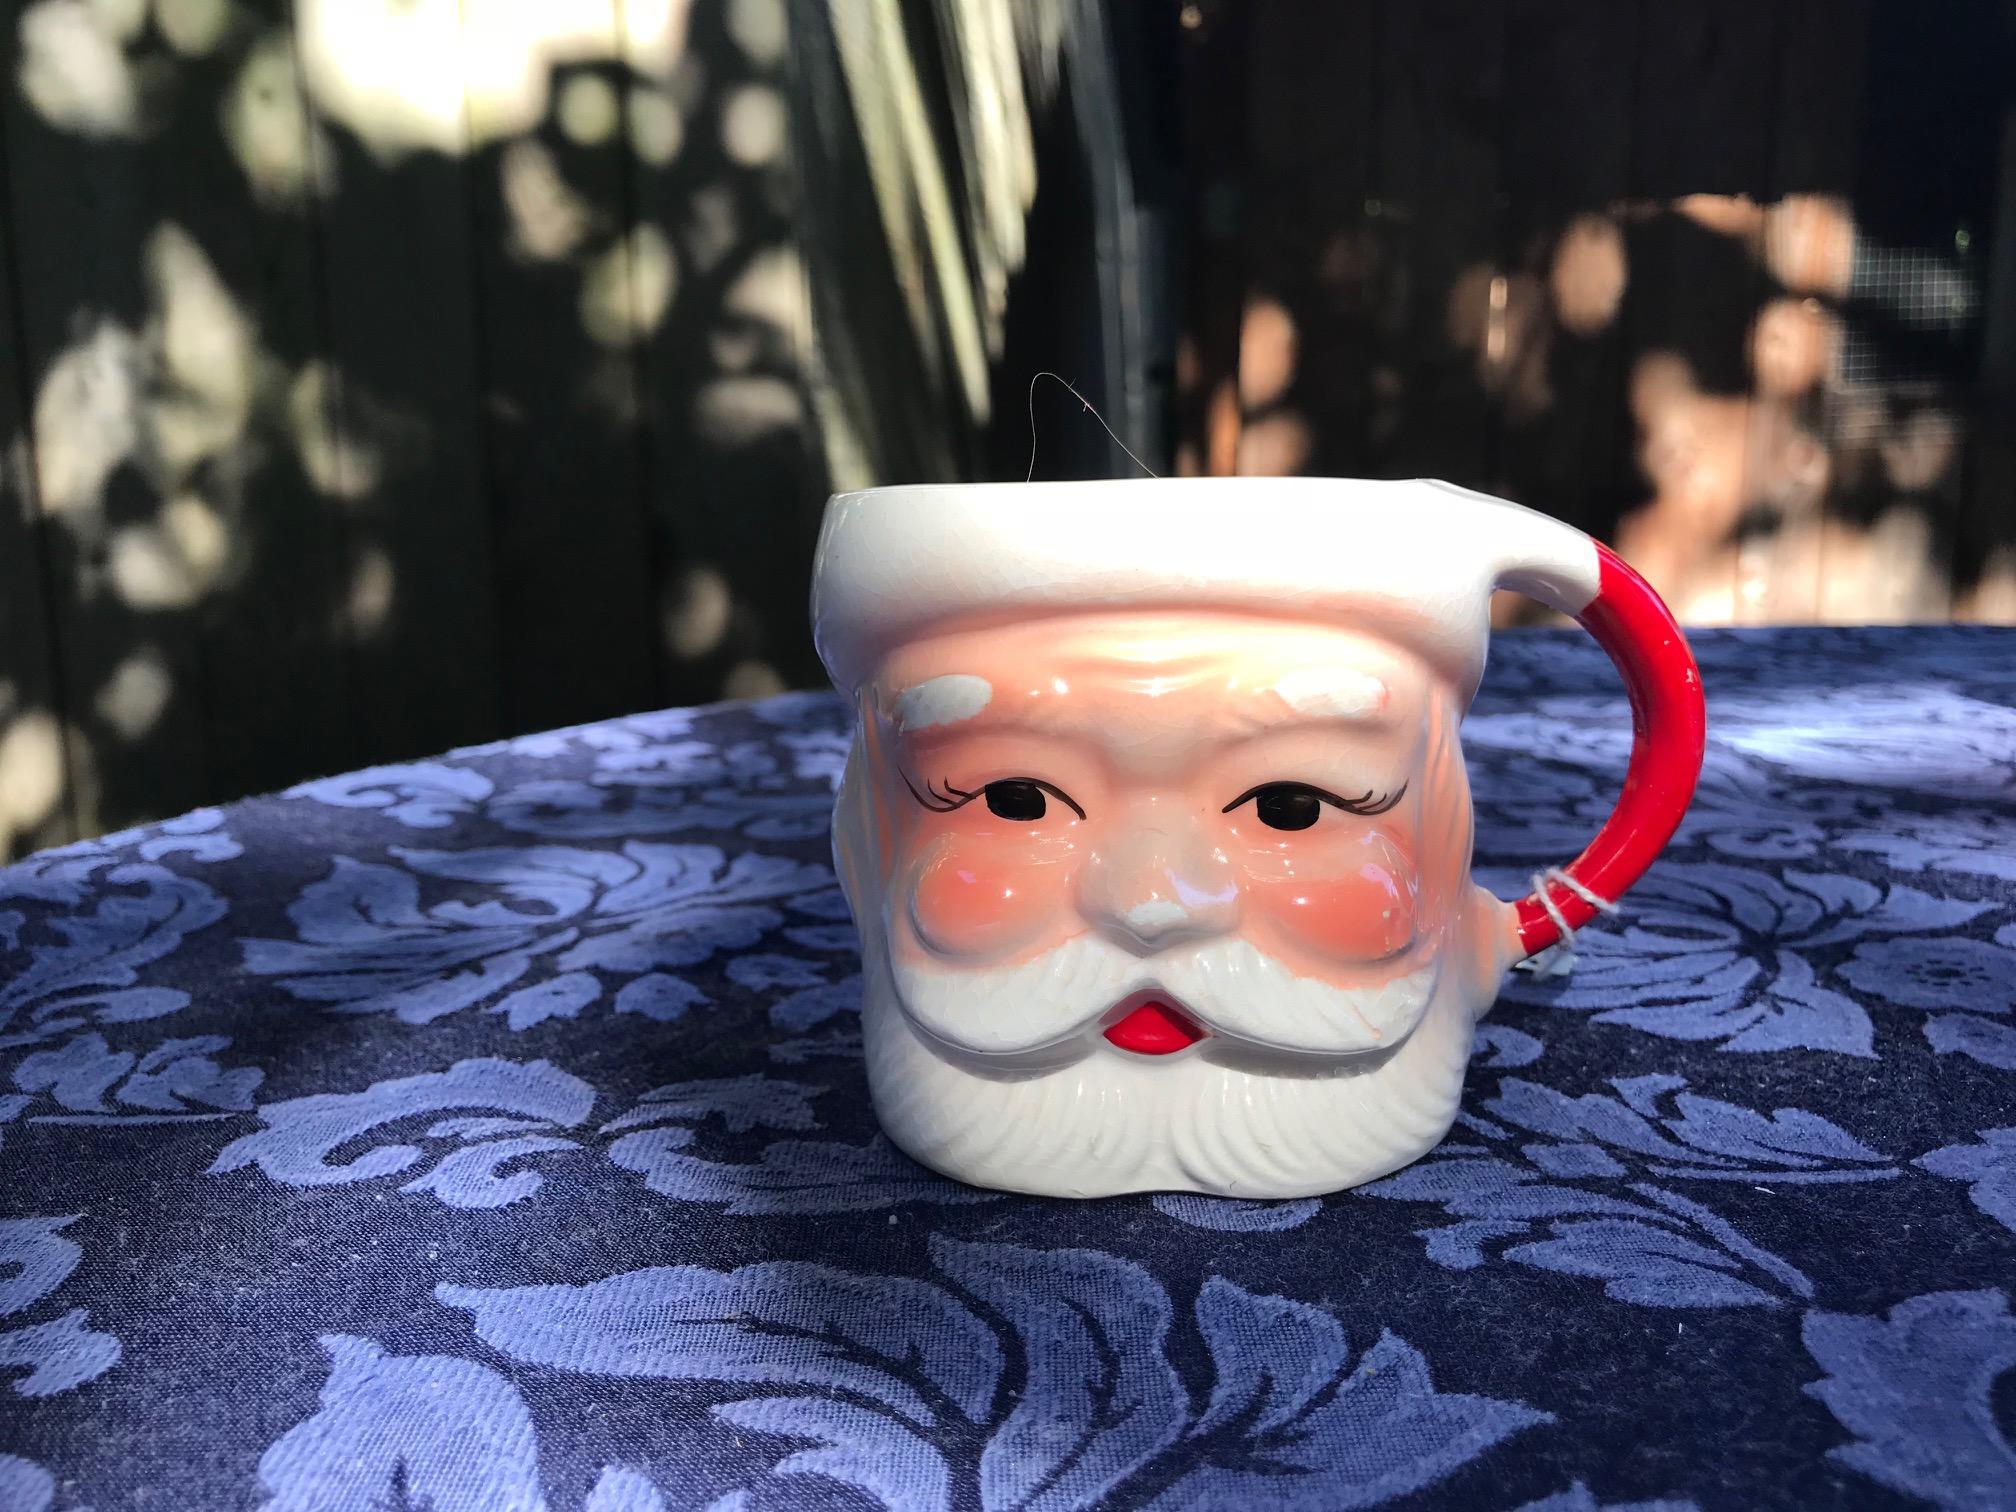 Vintage Made In Japan Ceramic Santa Claus Christmas Mug: as high as 5,077 ppm Lead.